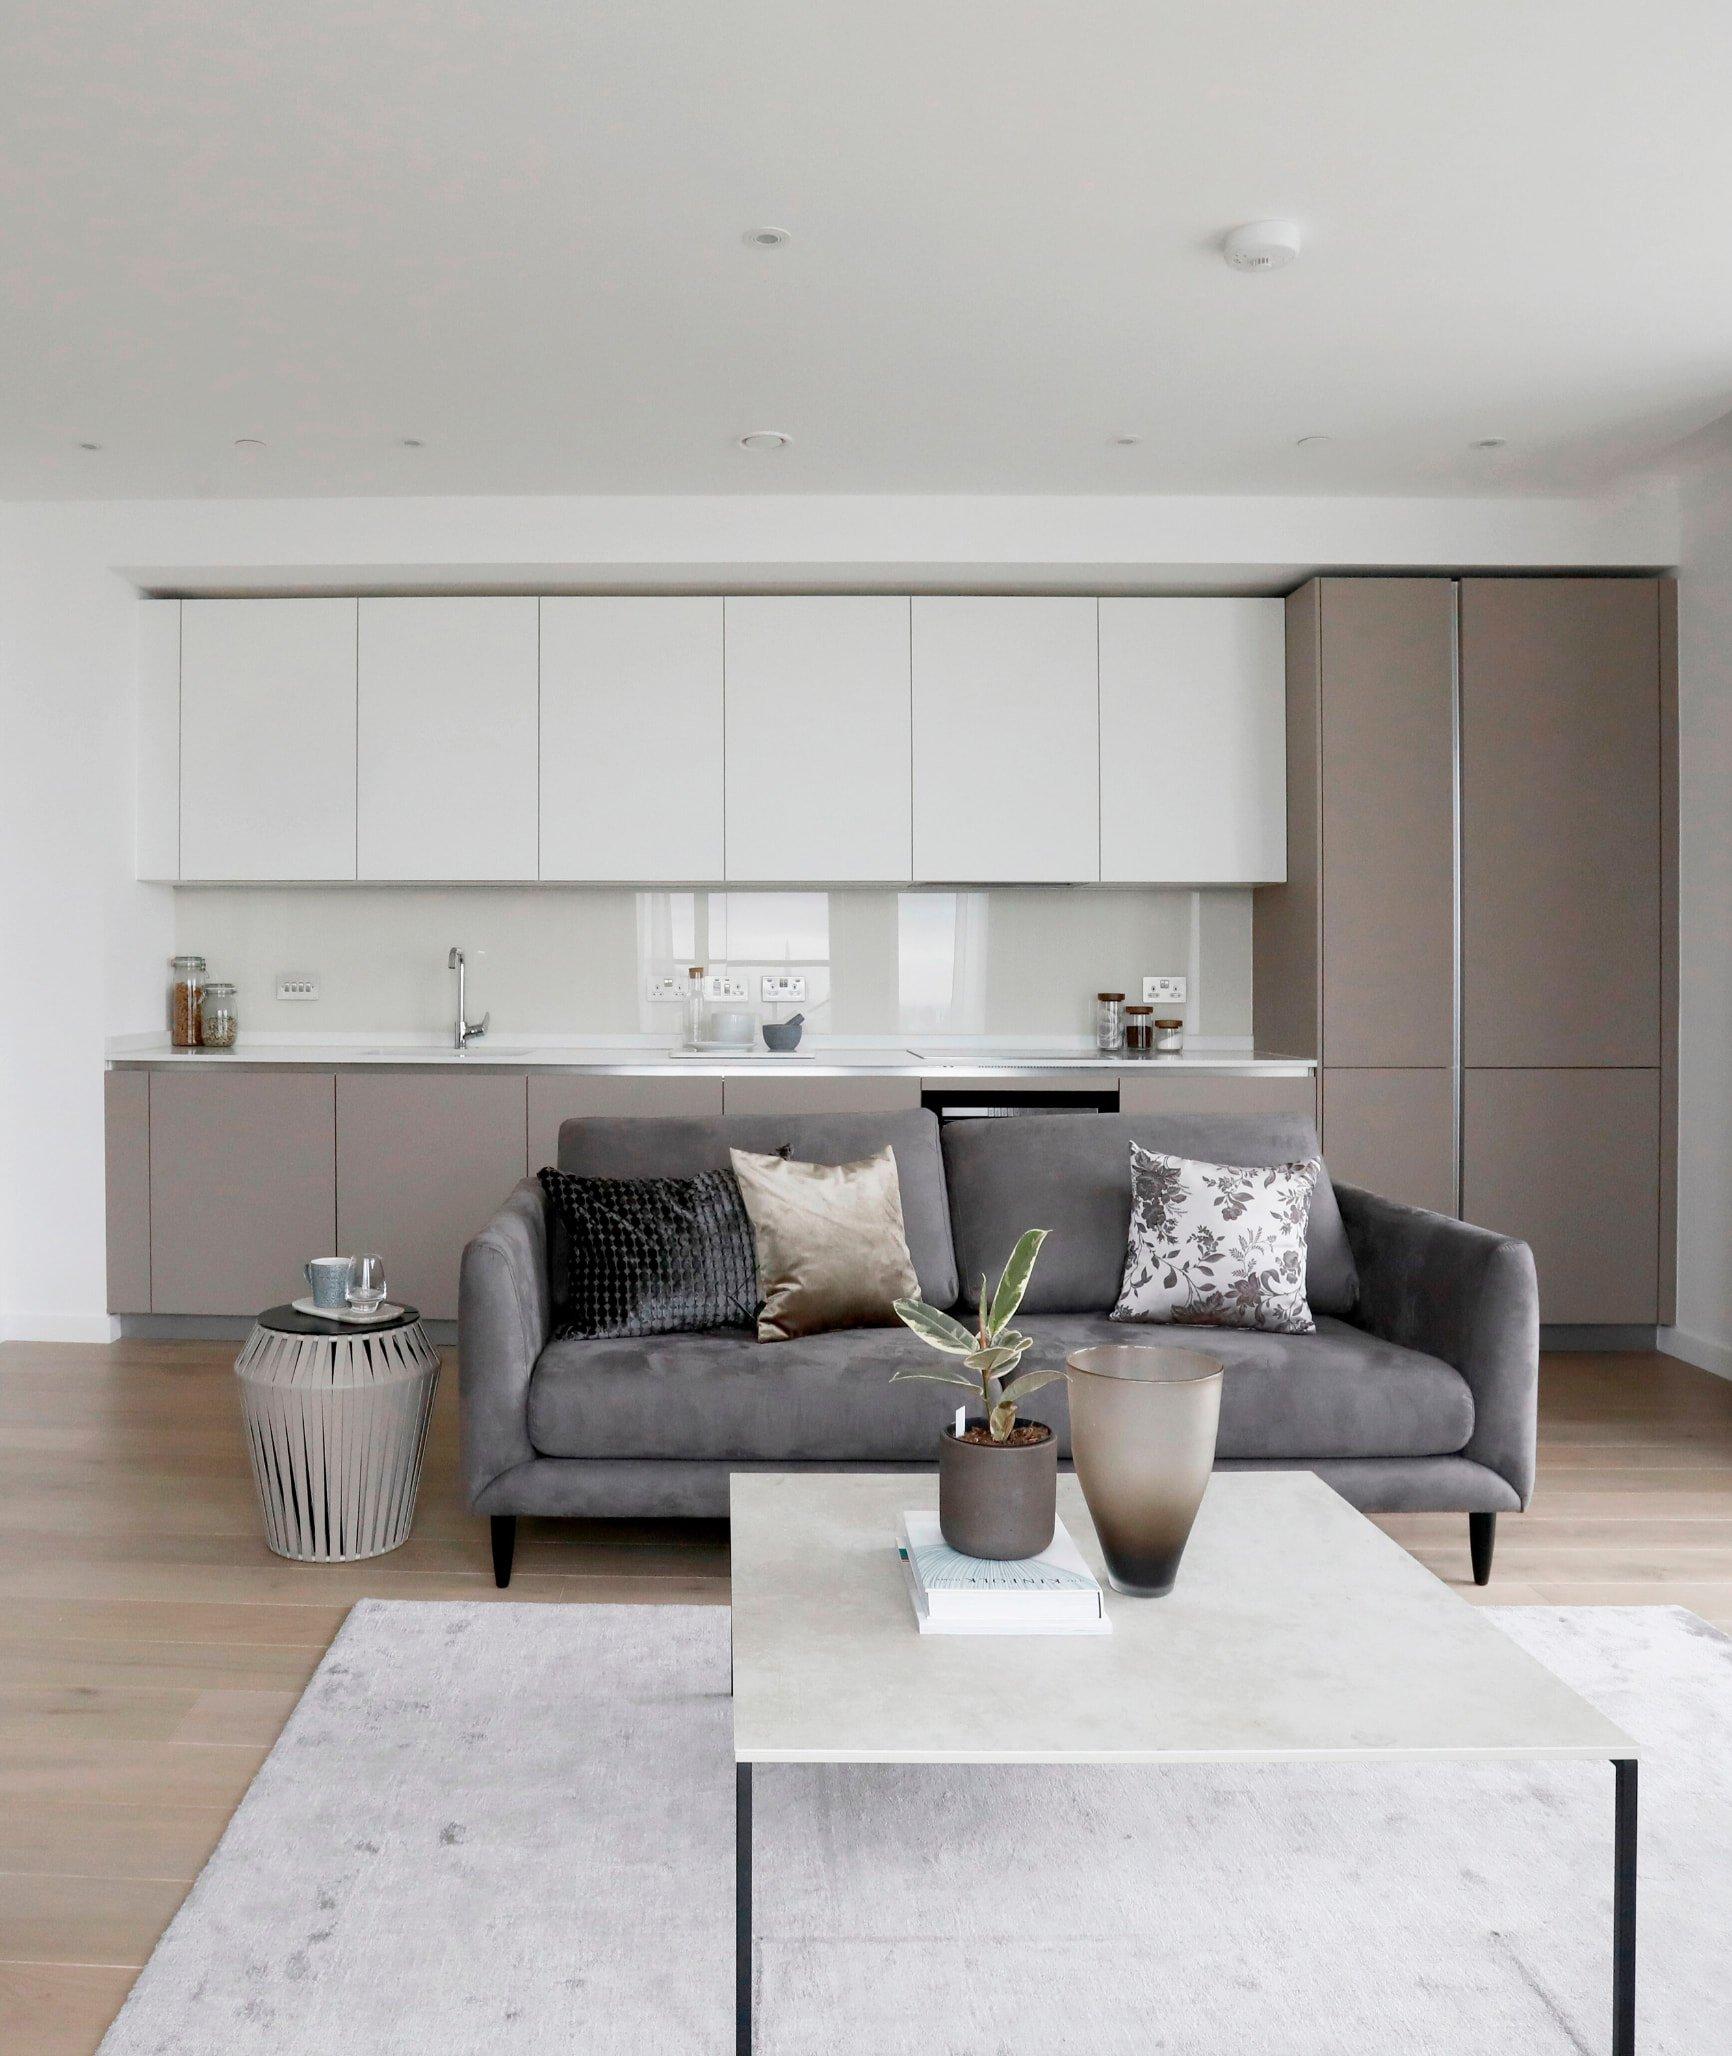 BoConcept Furniture Design in Flat